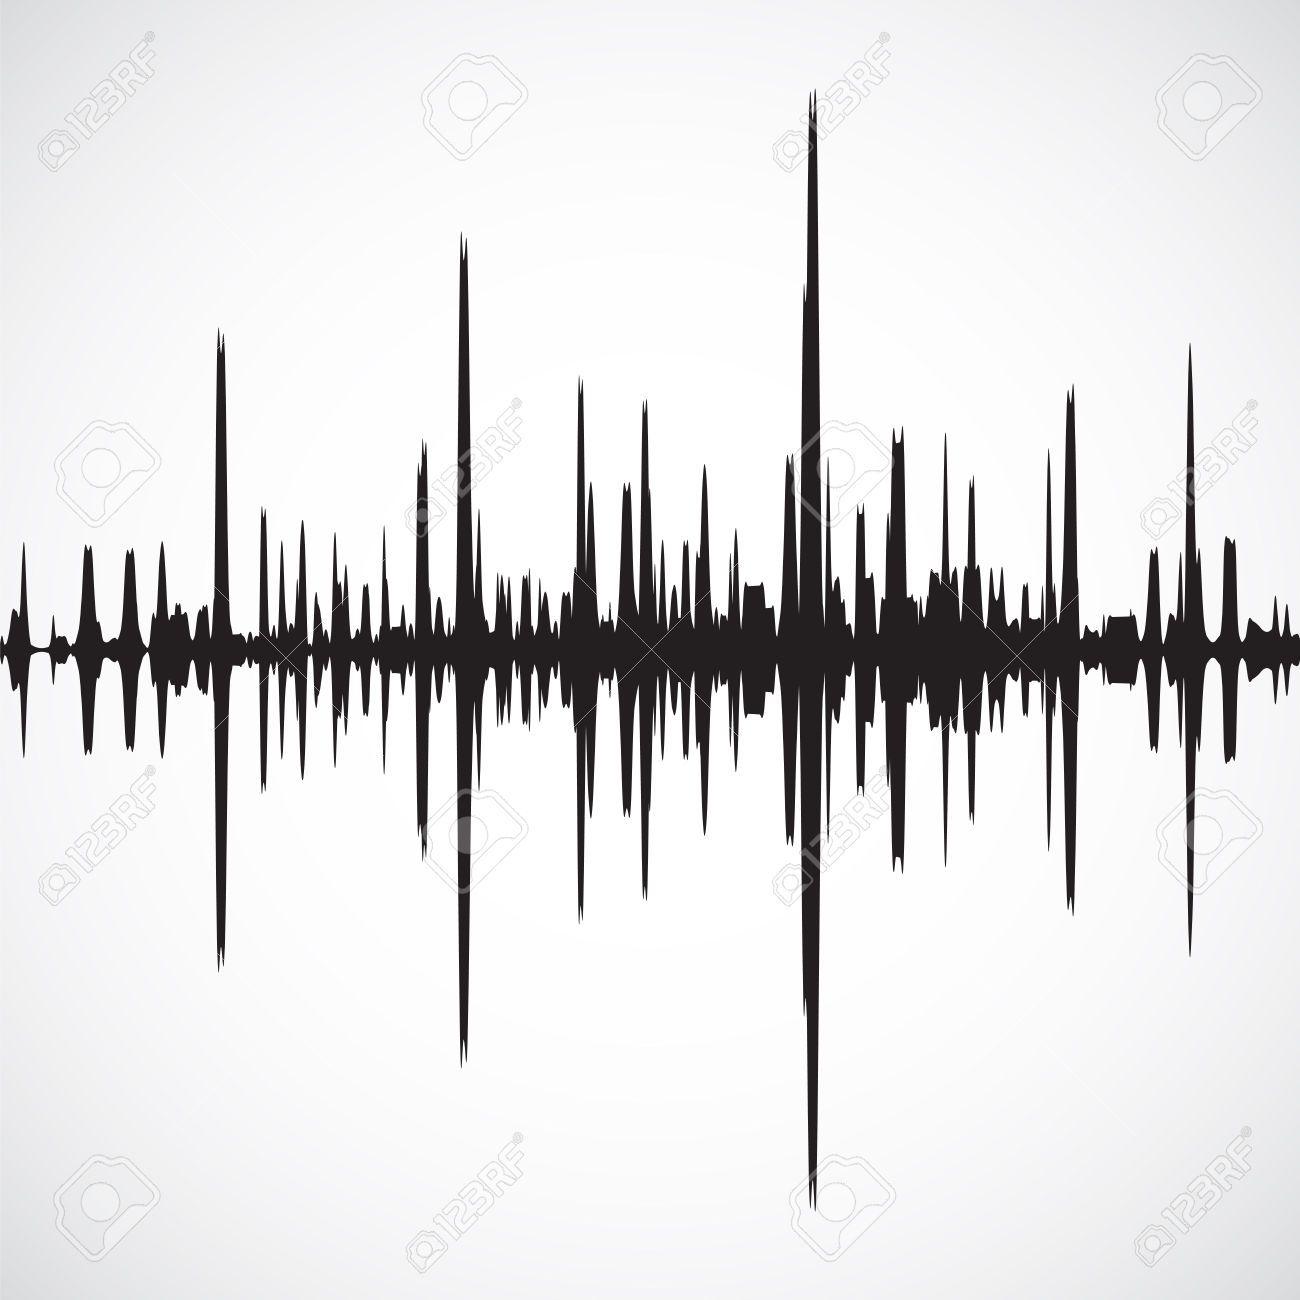 k t qu h nh nh cho sound waves social media pinterest sound rh pinterest com sound wave vector free sound wave vector free